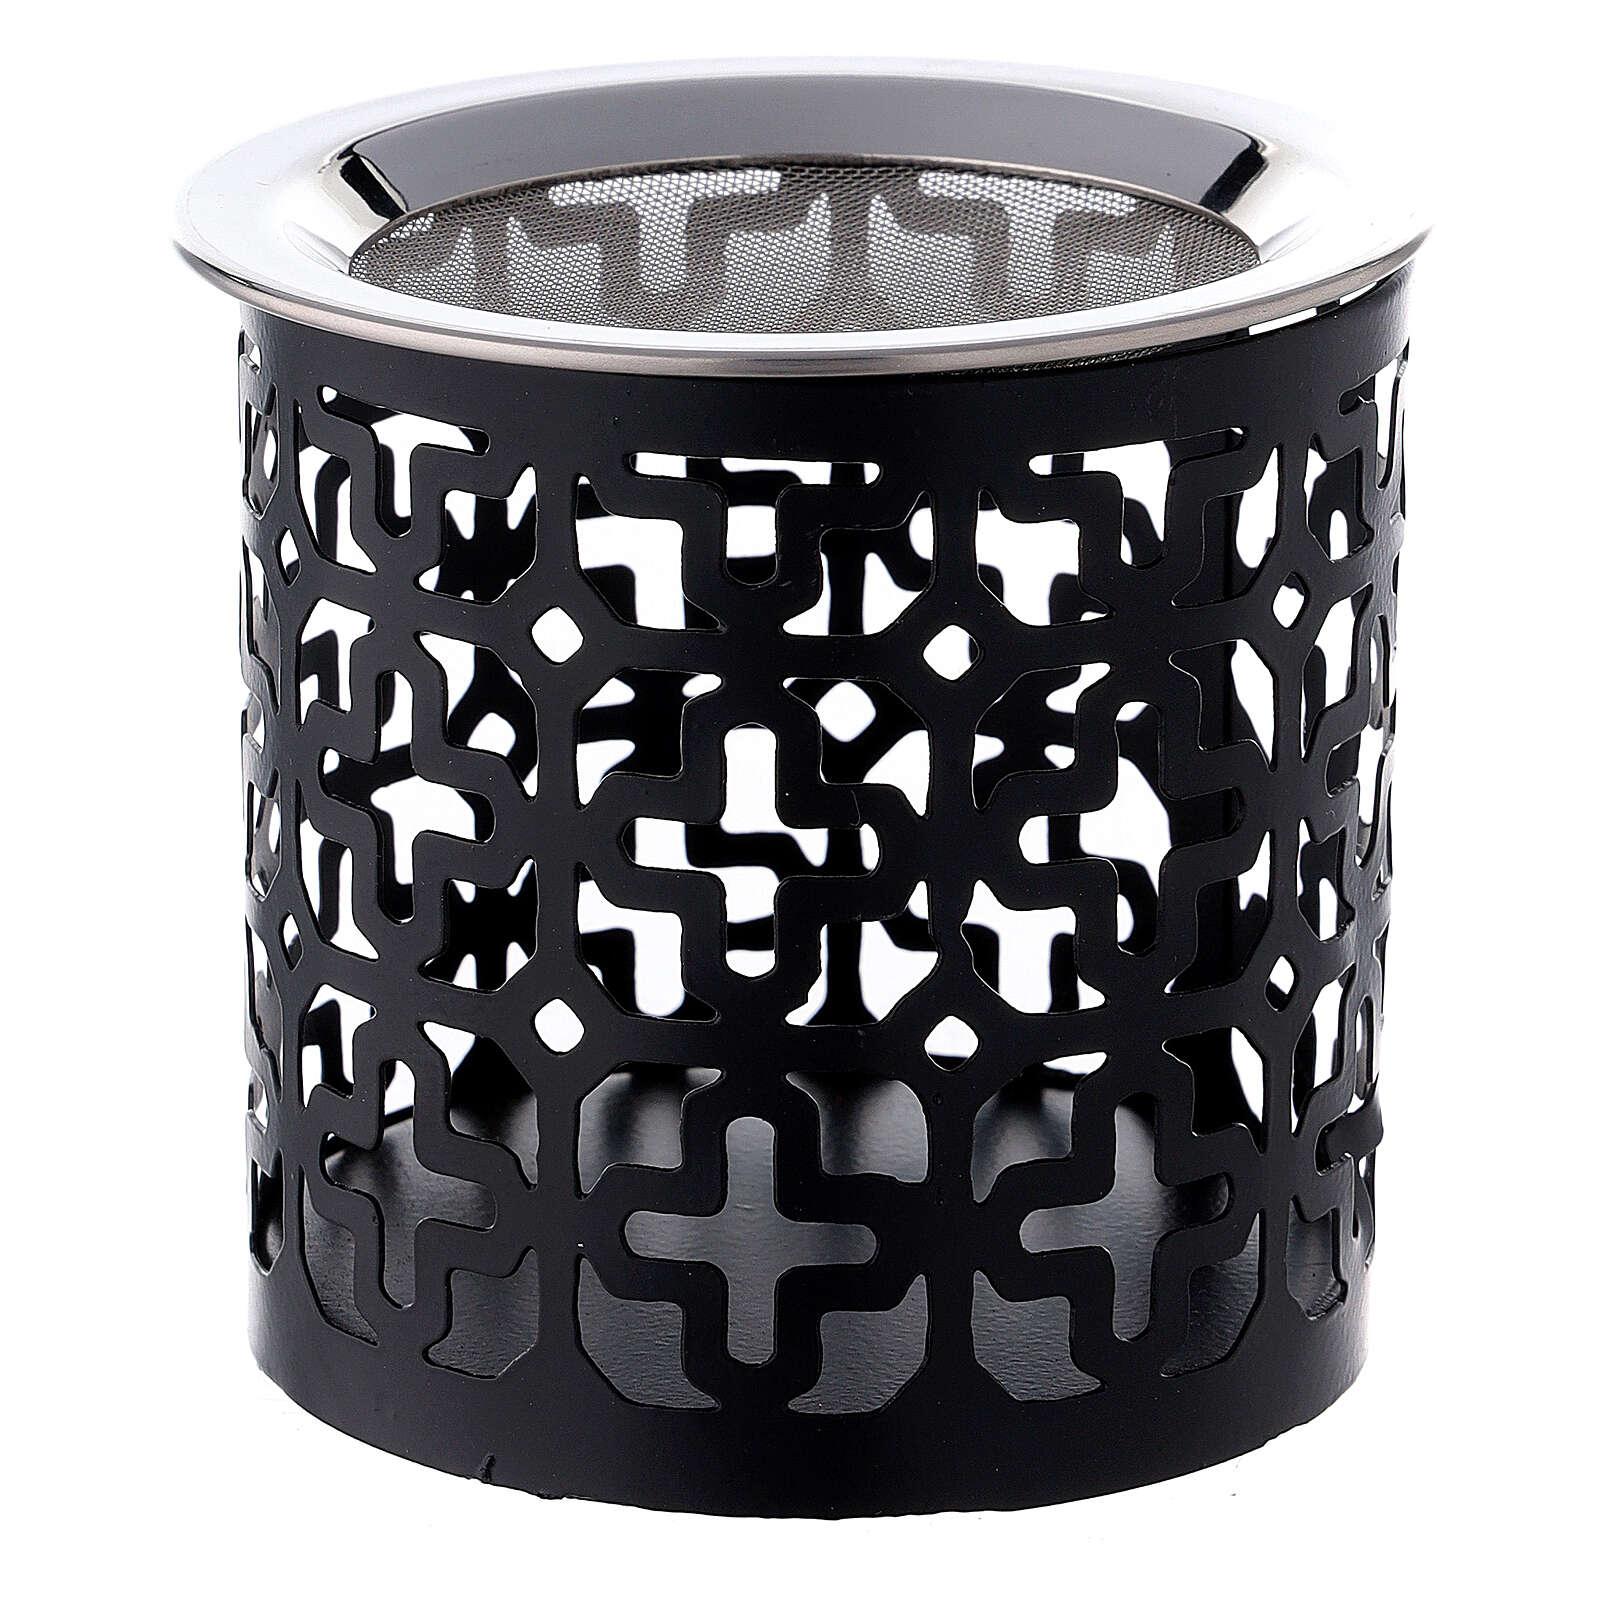 Pebetero cruces perforadas hierro negro 8 cm 3